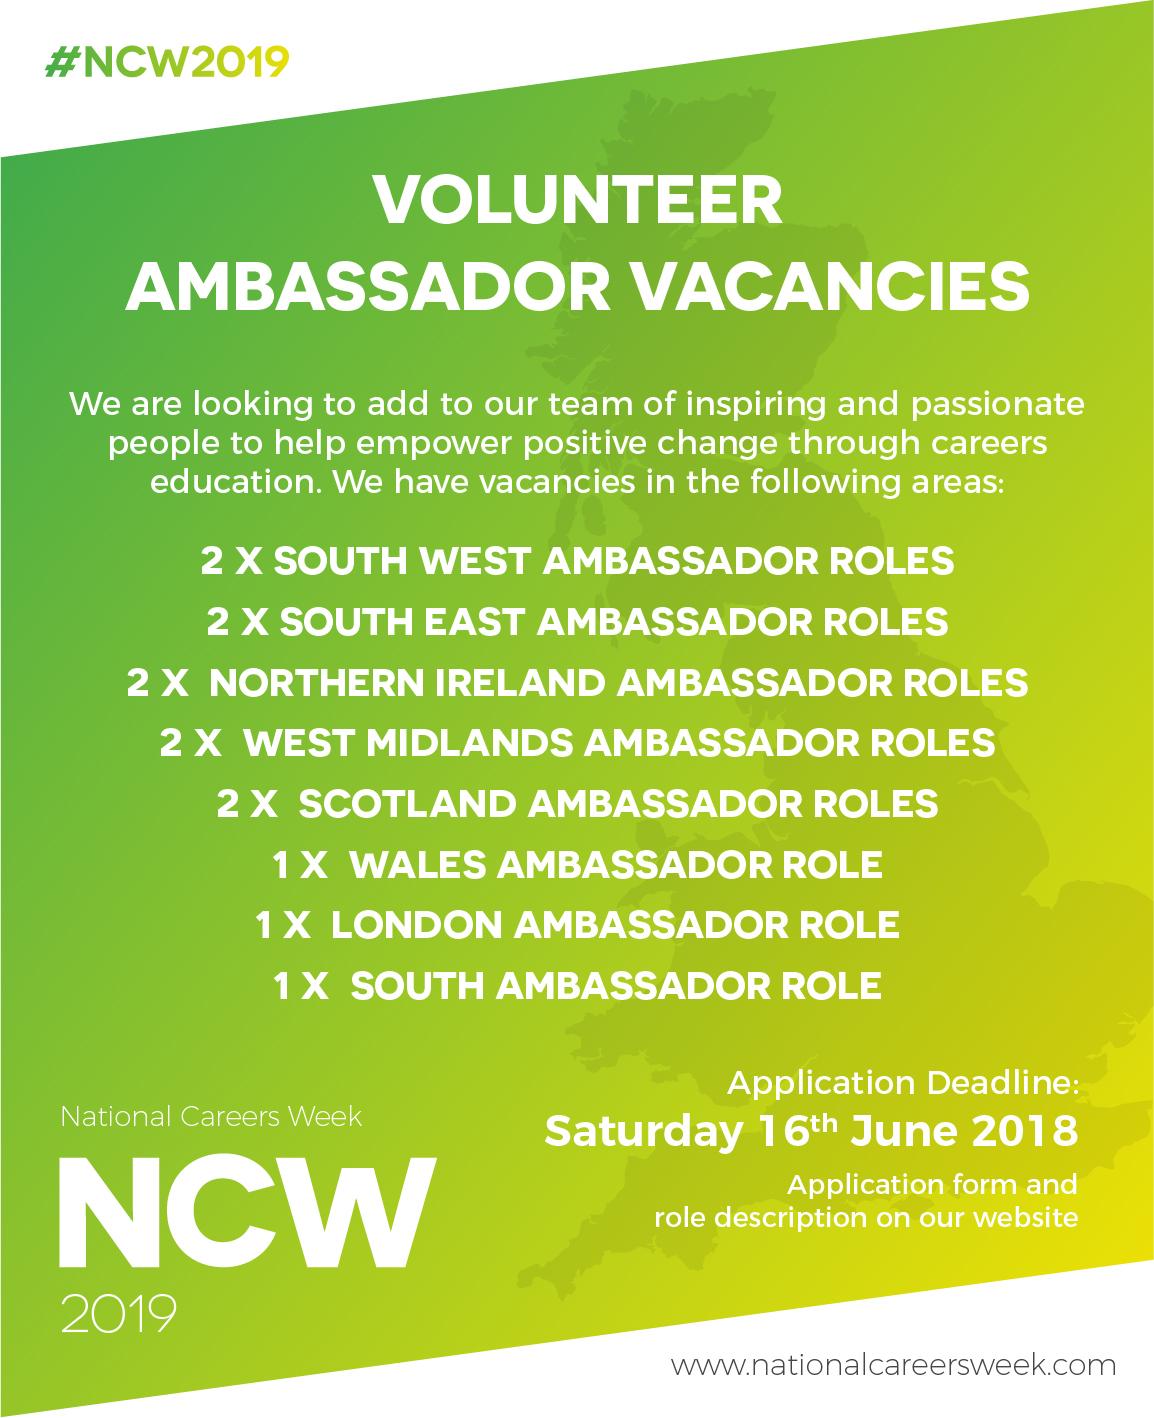 ncw-ambassador-vacancy-post-02